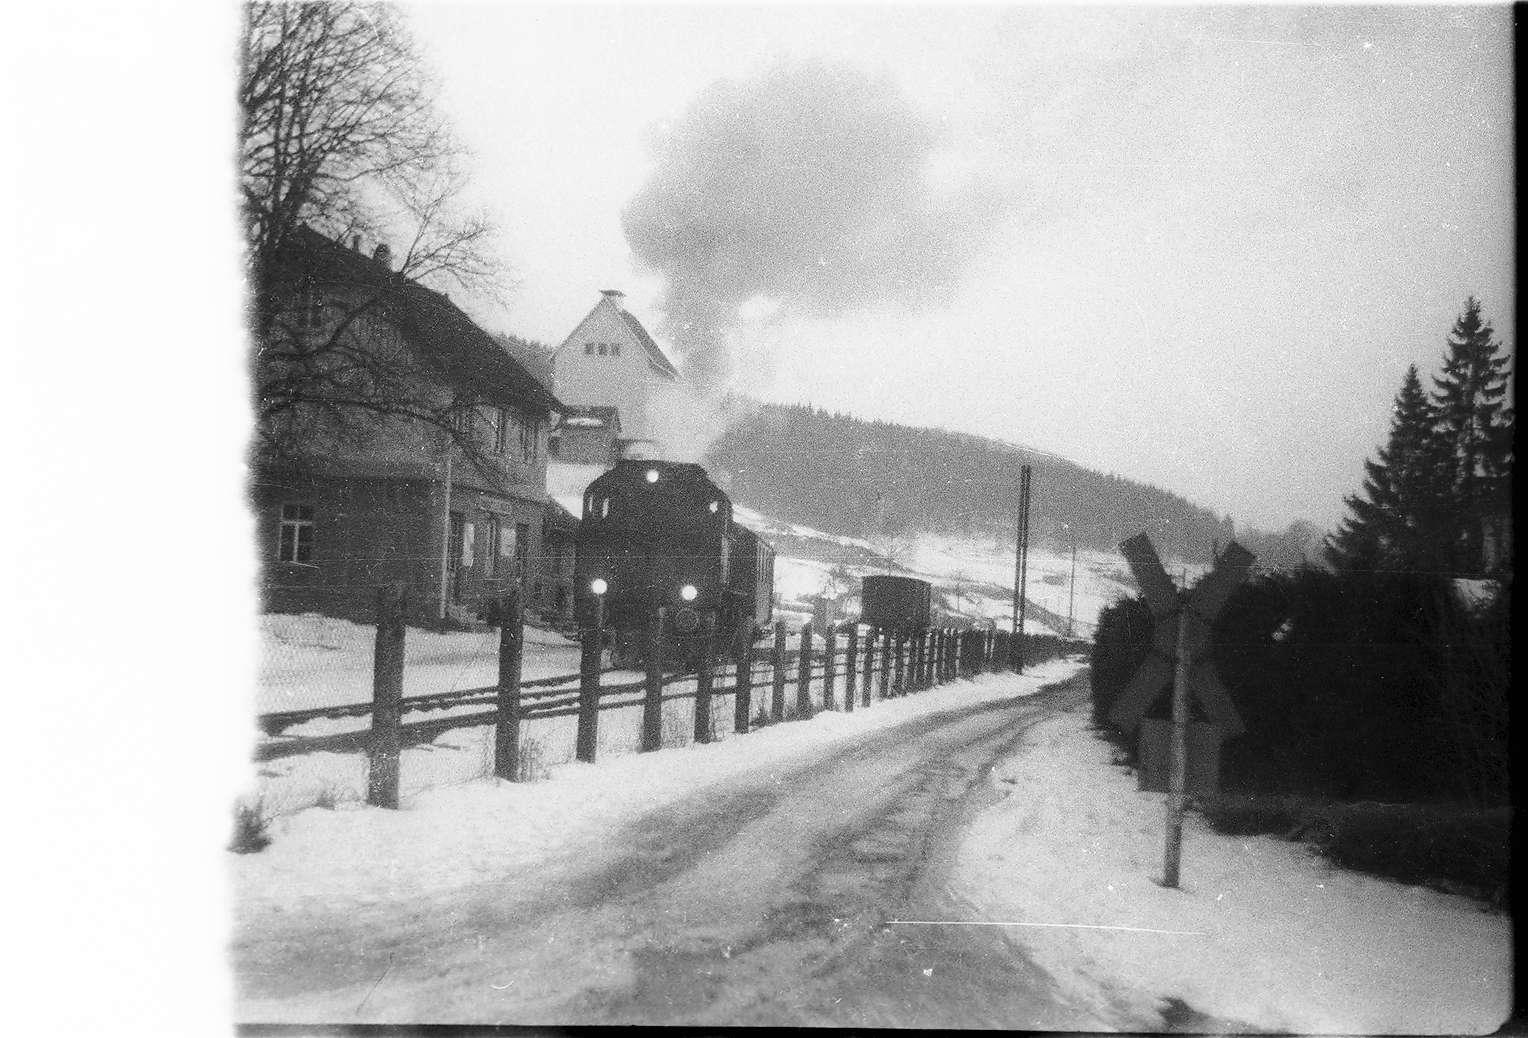 Trochtelfingen, Lok 141, Wagenabstellen am Lagerhaus, Bild 1